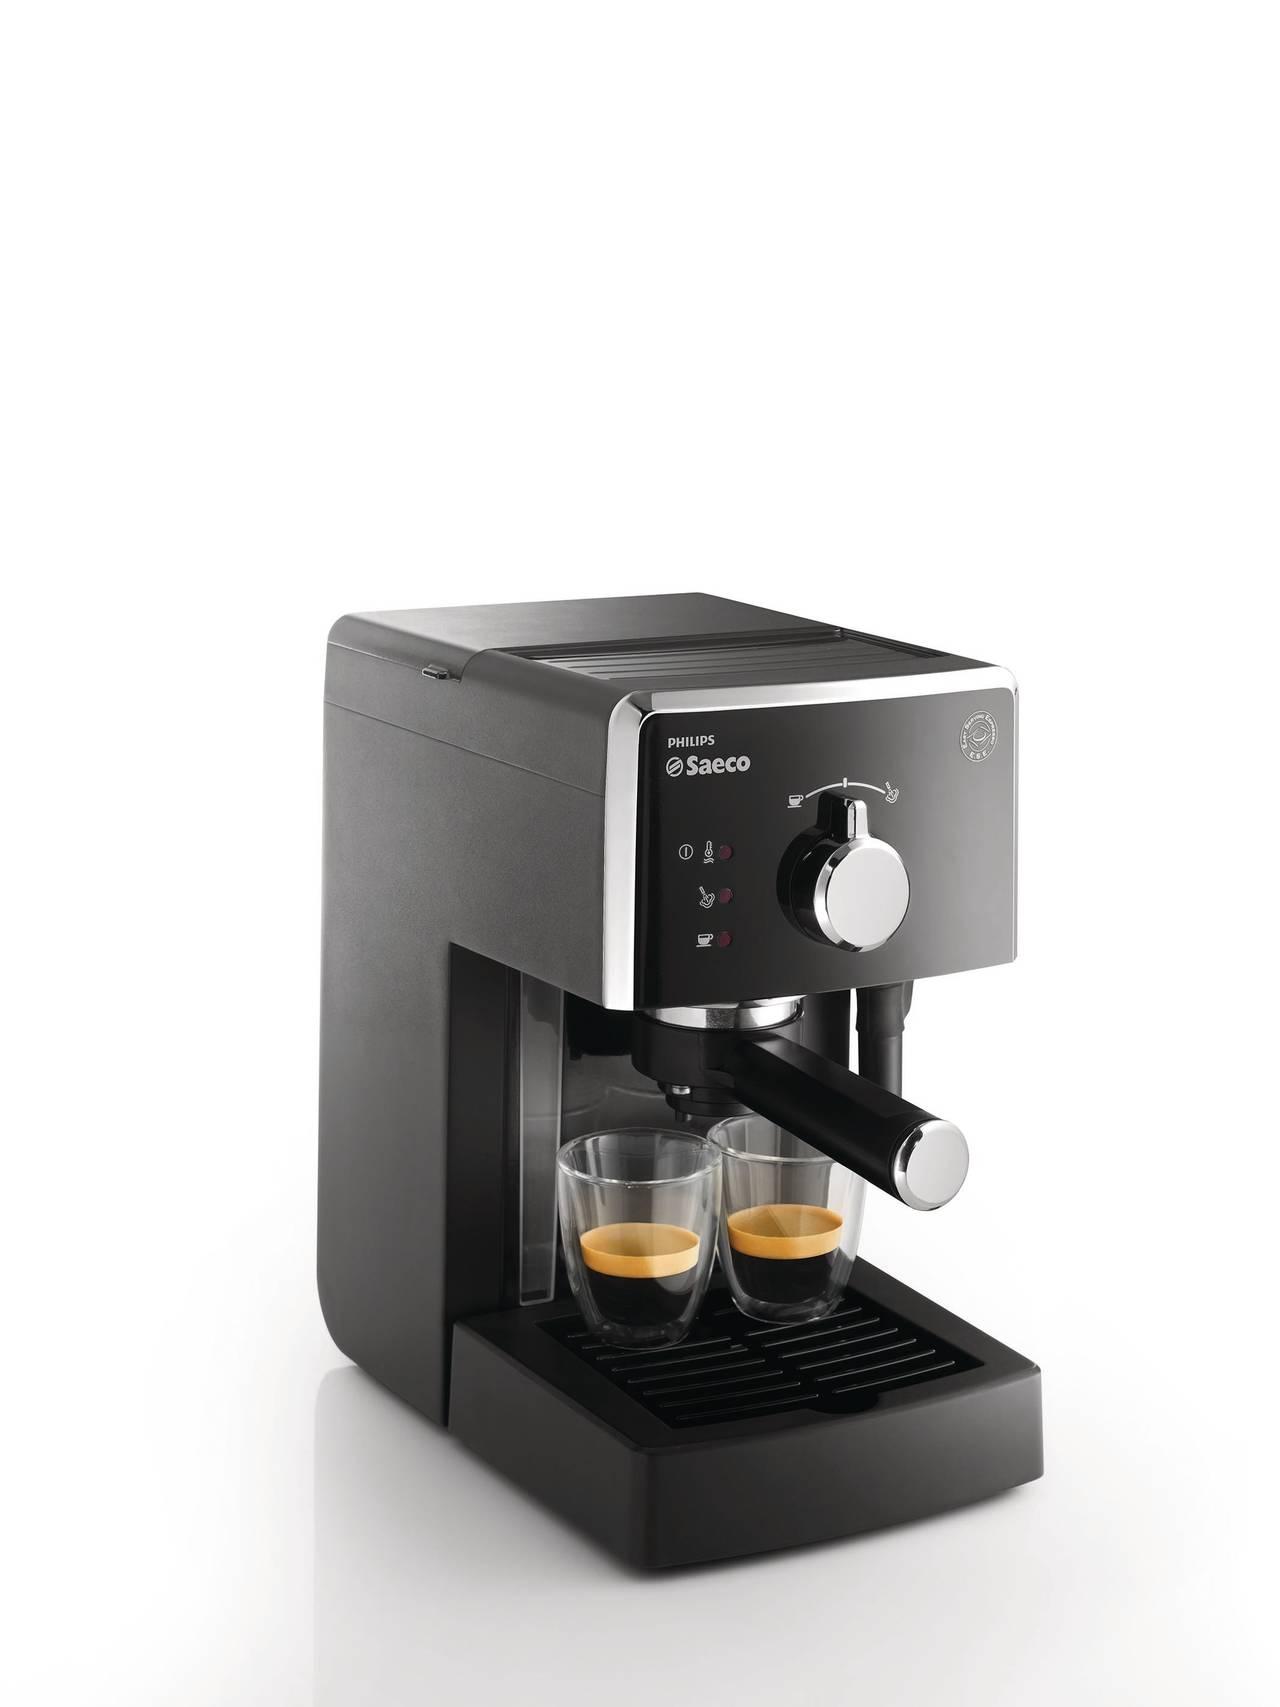 Saeco Poemia HD 8423 macchina da caffè cialde e macinato   Brands Award